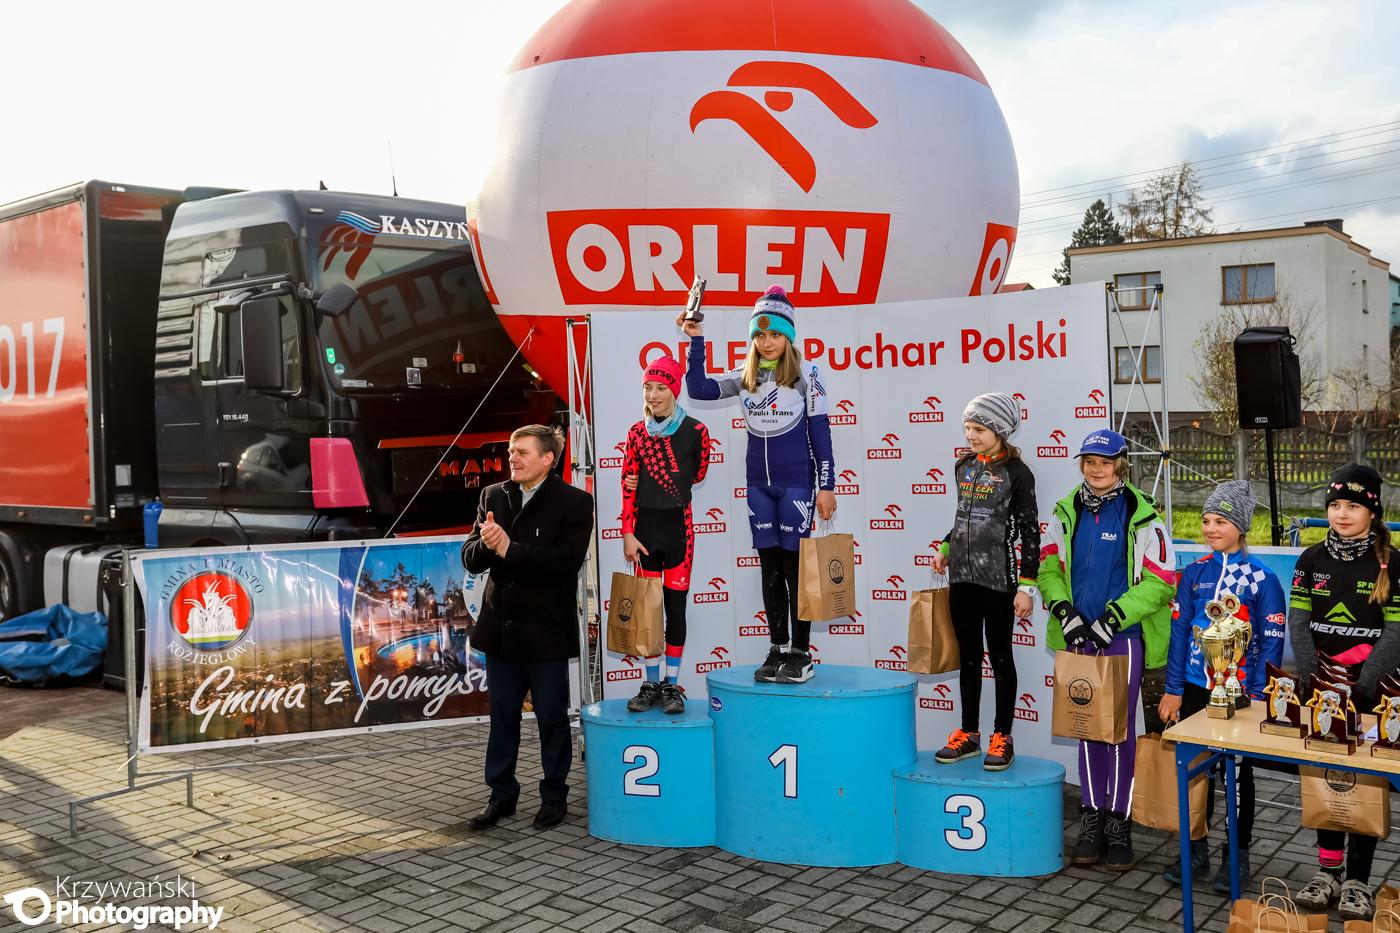 https://magazynrowerowy.pl/logmein/wp-content/uploads/2017/11/Orlen-PP-CX-VIII-seria_Kozieglowy_1311_.jpg